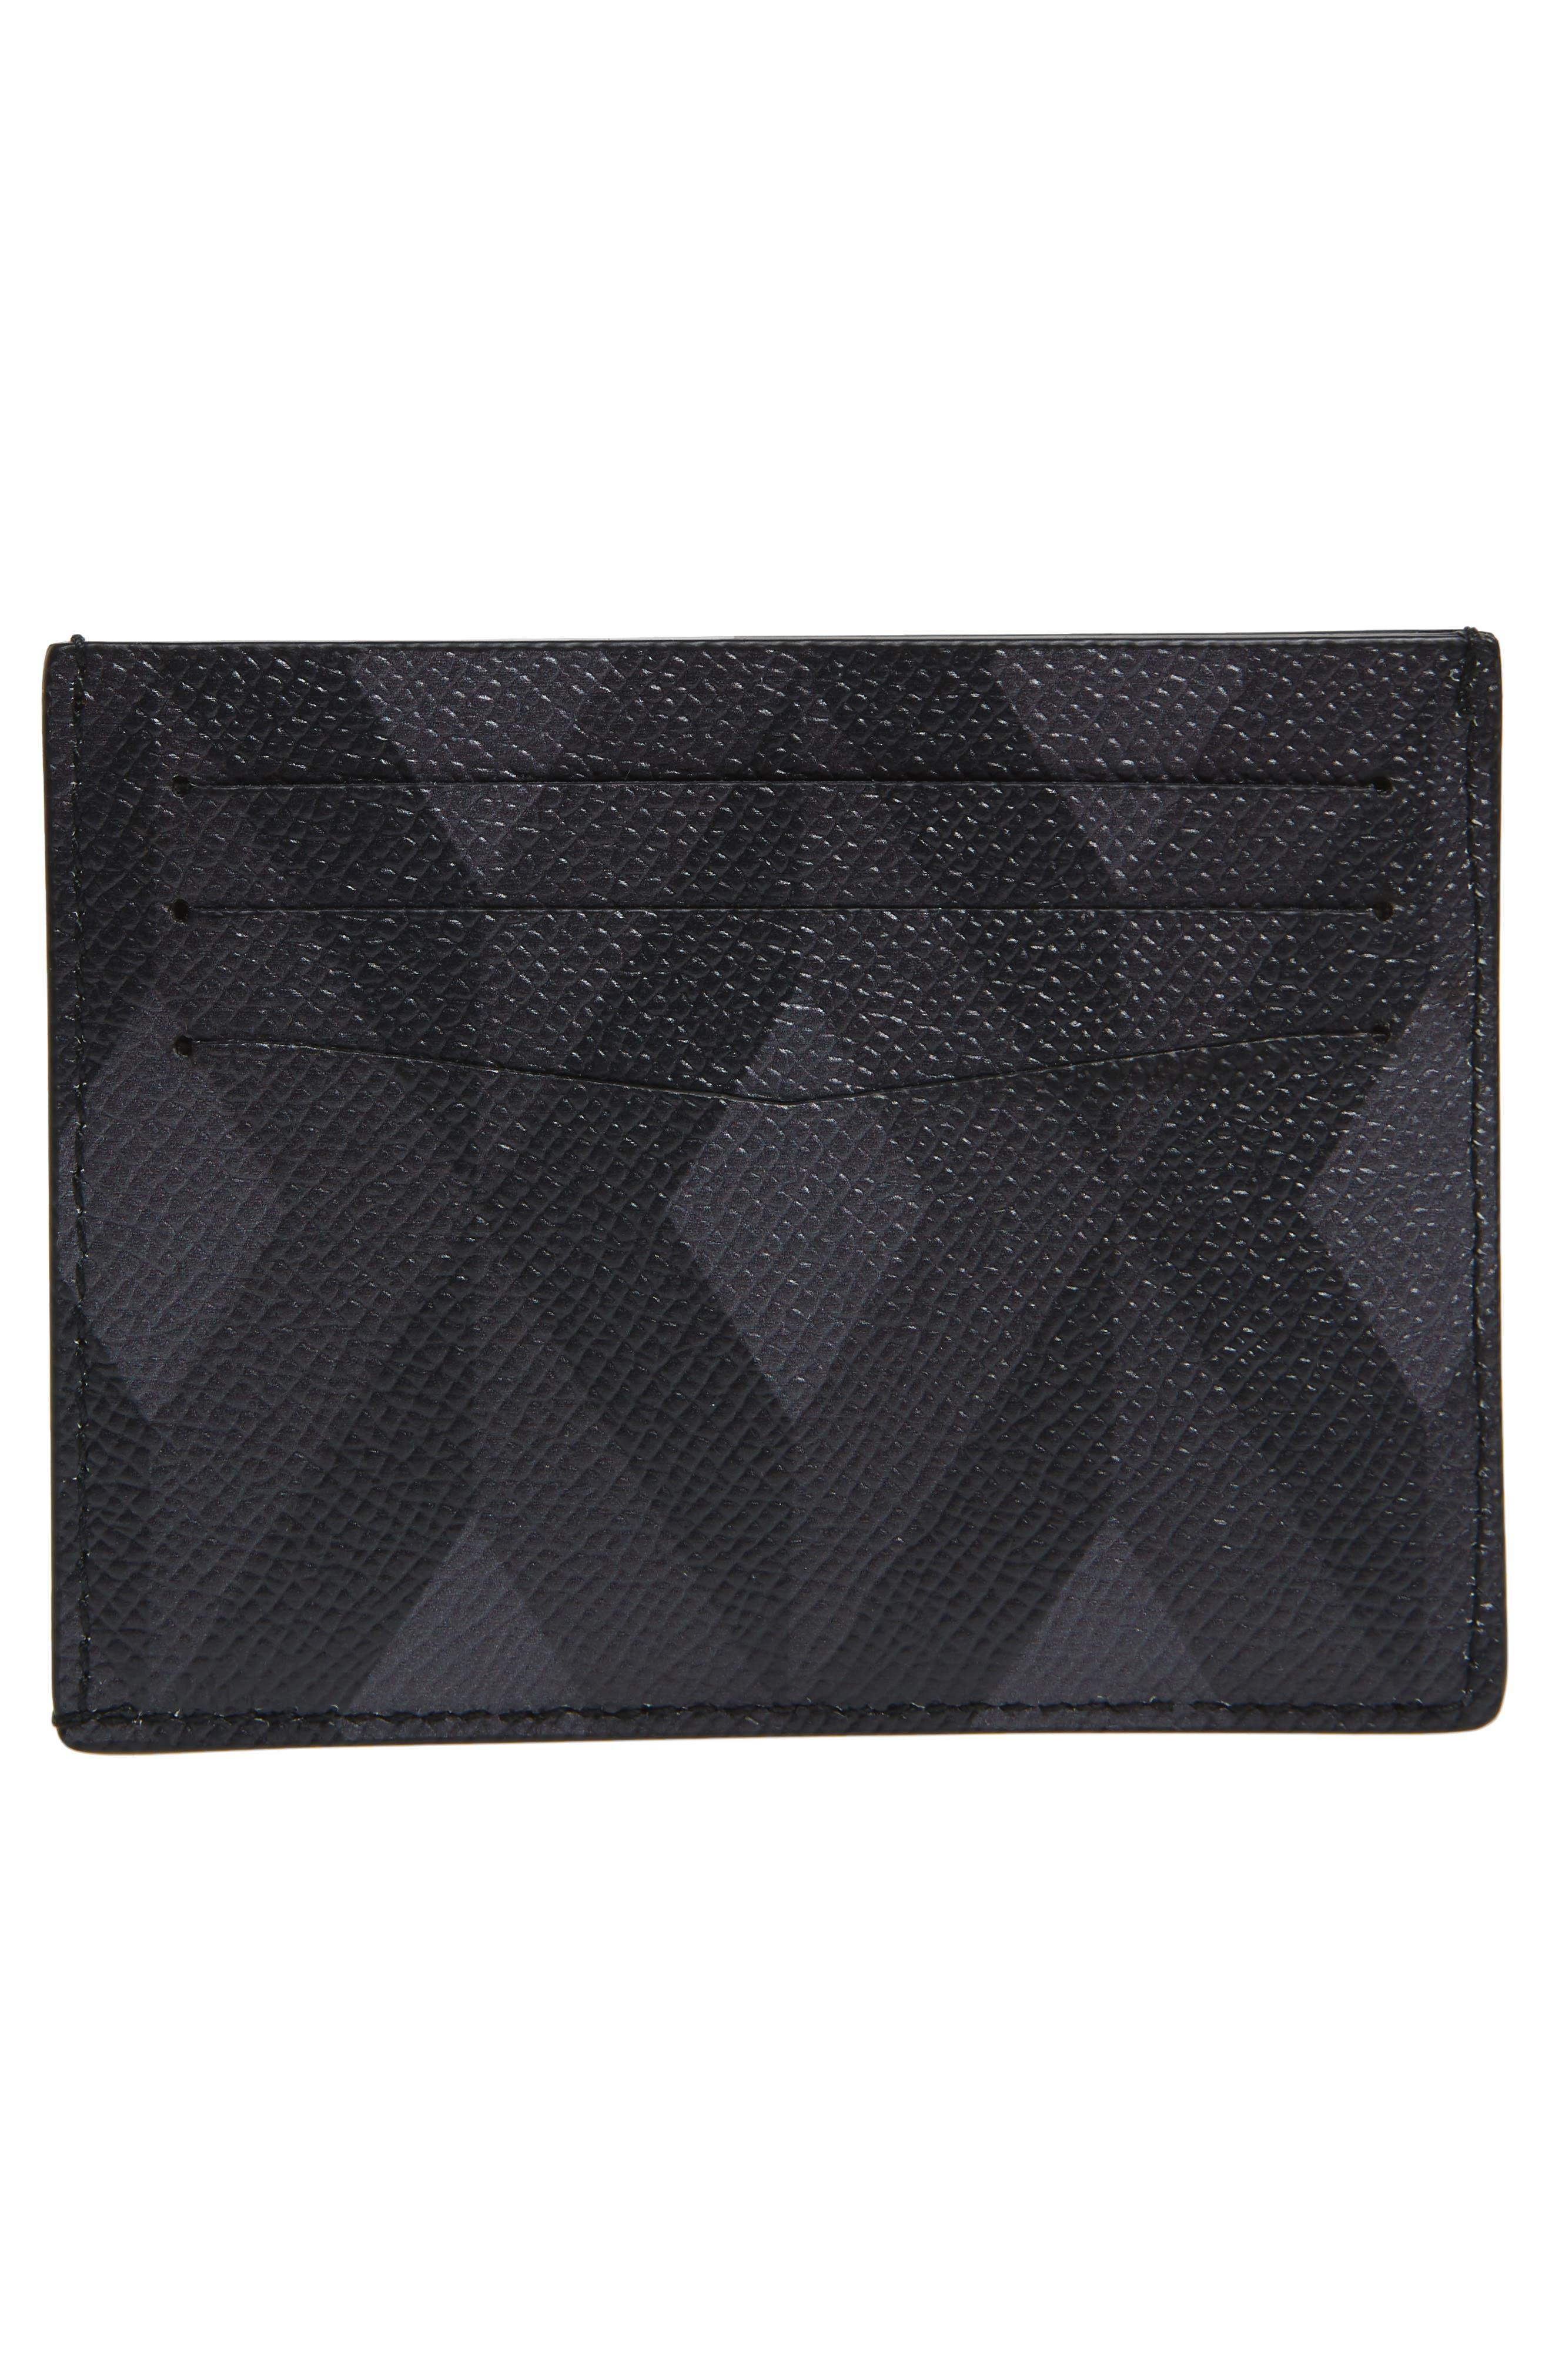 Alternate Image 2  - Dunhill Cadogan Diamond Print Leather Card Case